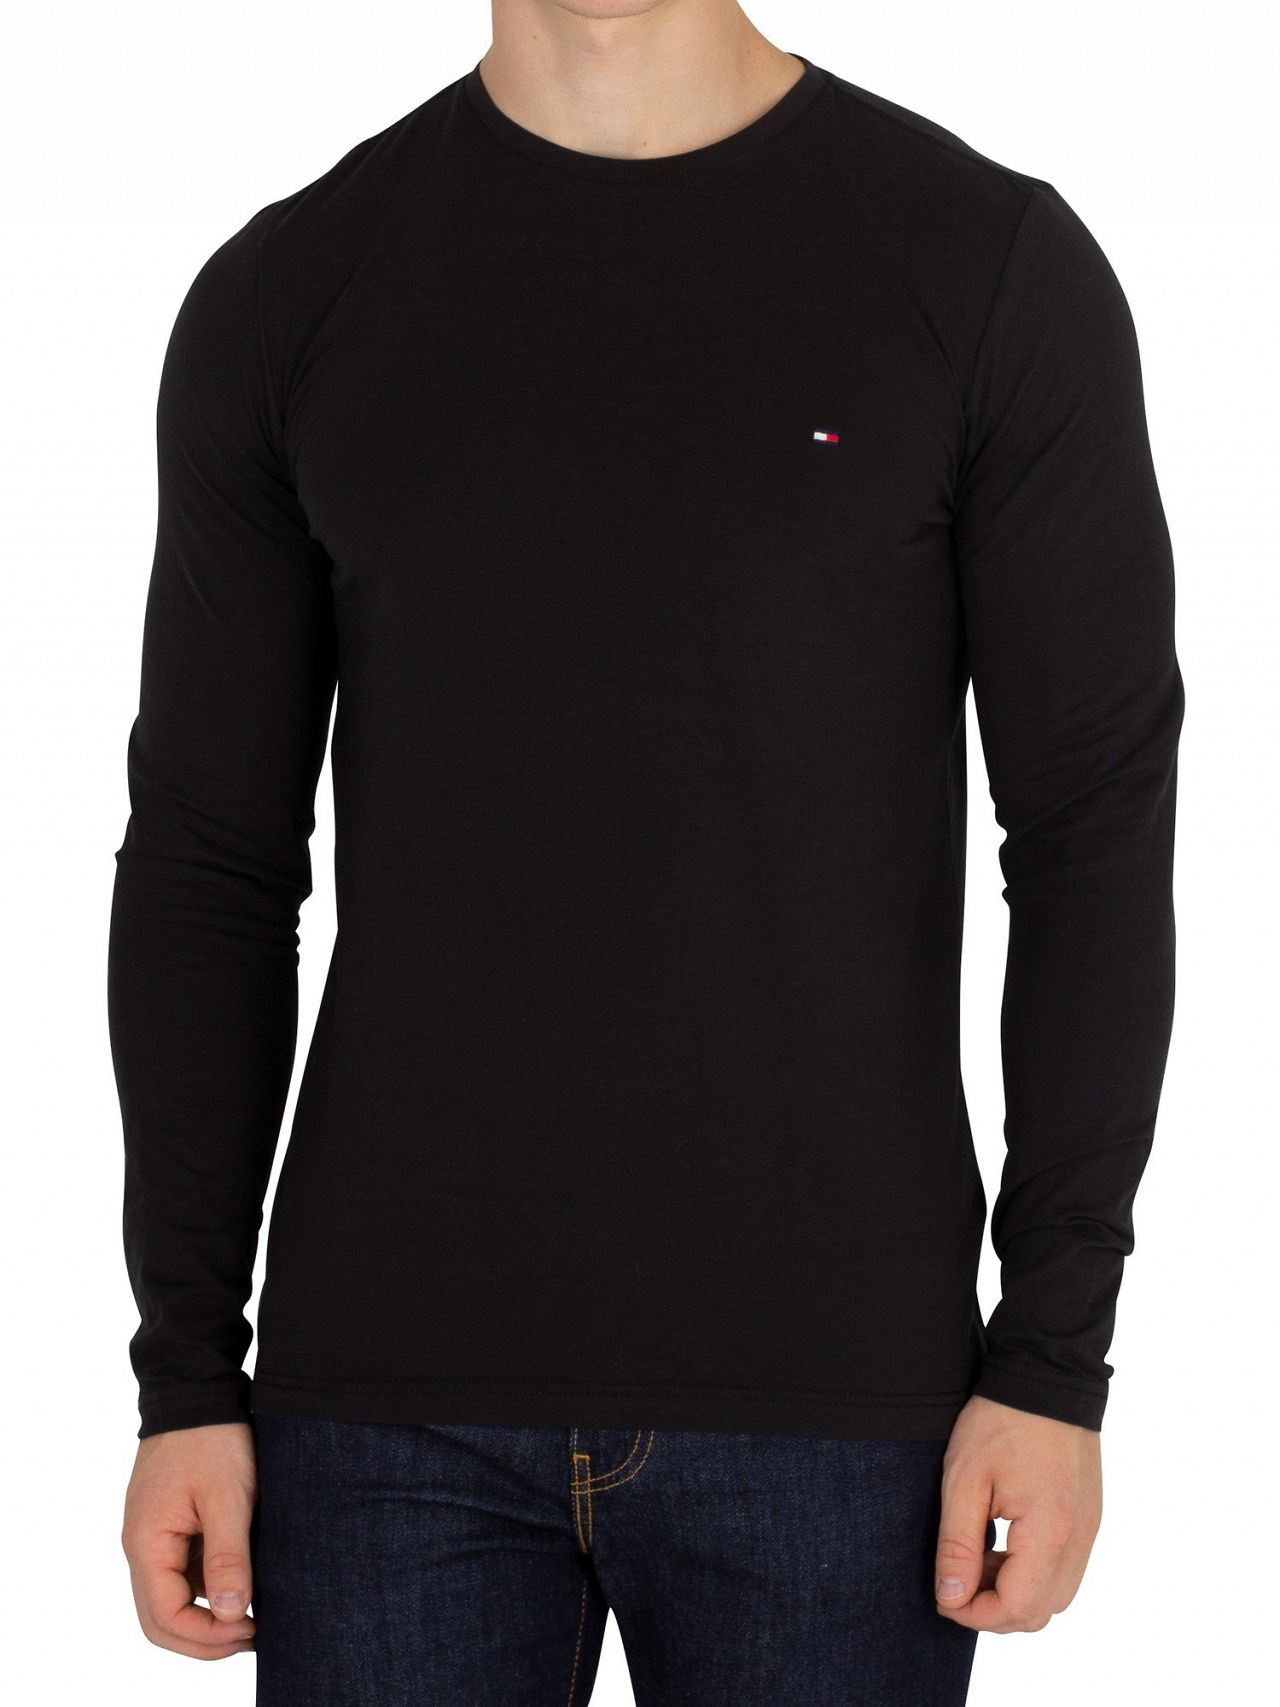 44b9762c Tommy Hilfiger Jet Black Longsleeved Stretch Slim Fit T-Shirt | Standout